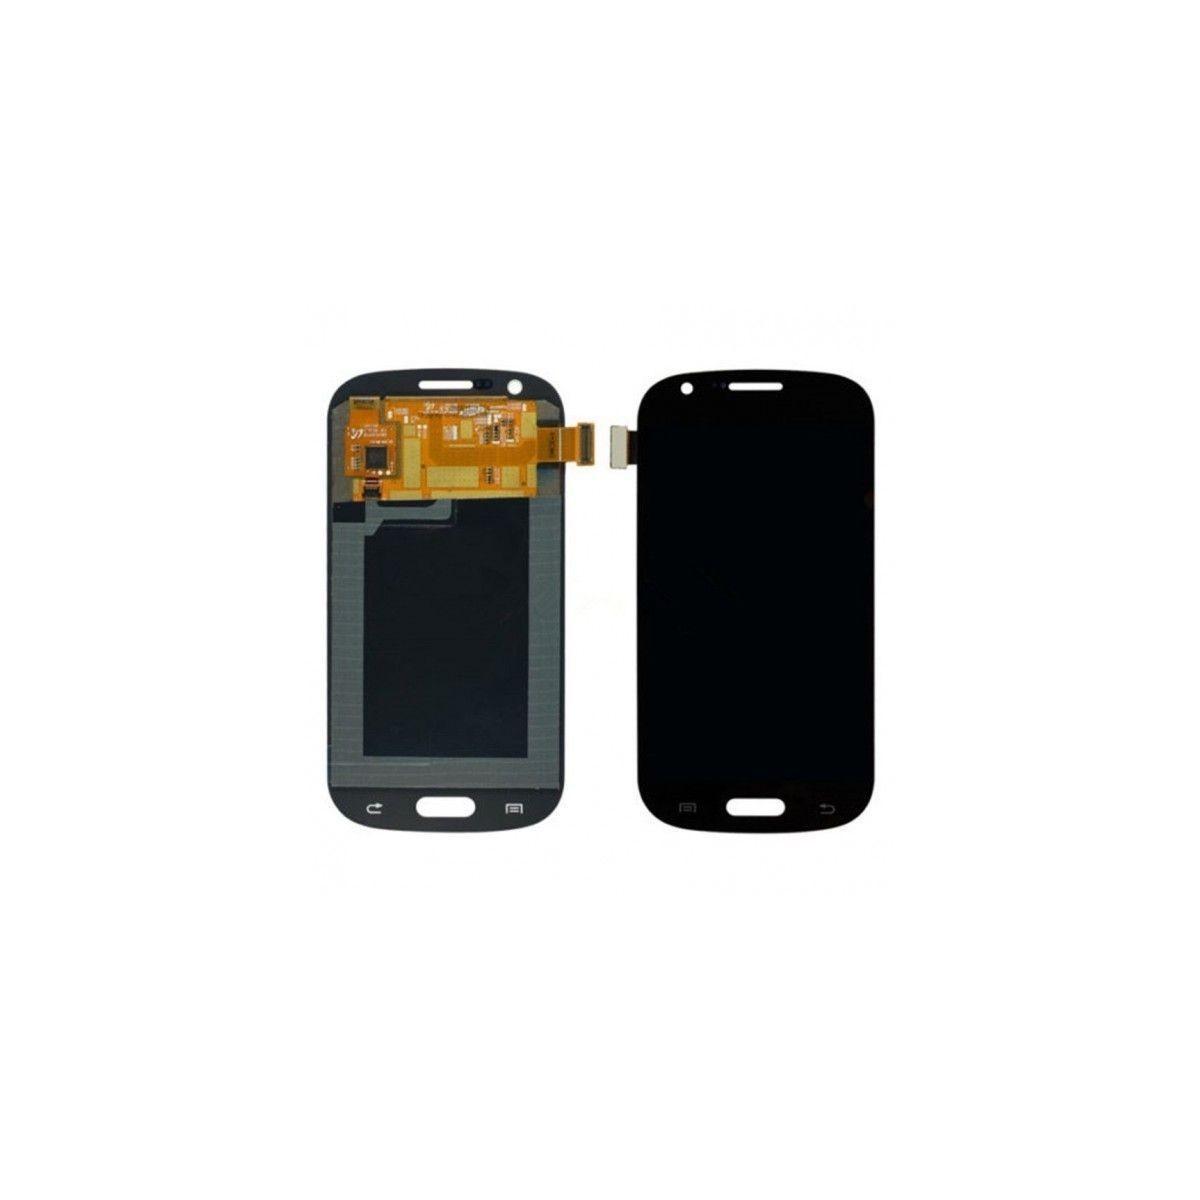 pantalla completa samunsung galaxy express i8730 gris